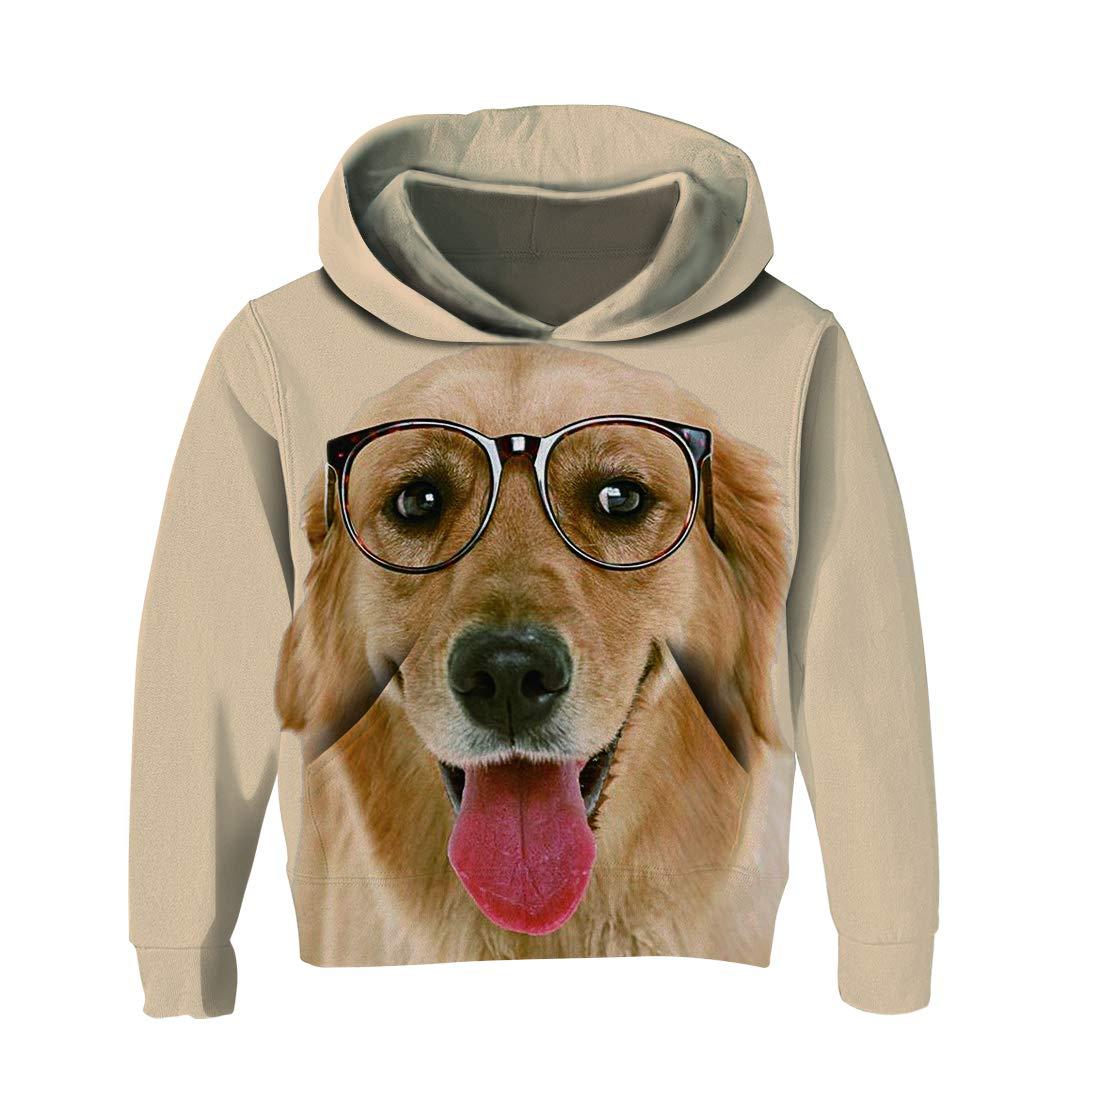 Galaxy 3D Print Kids Boys//Girls Hoodie Sweatshirt Pullover Jumper Coat Xmas 2019